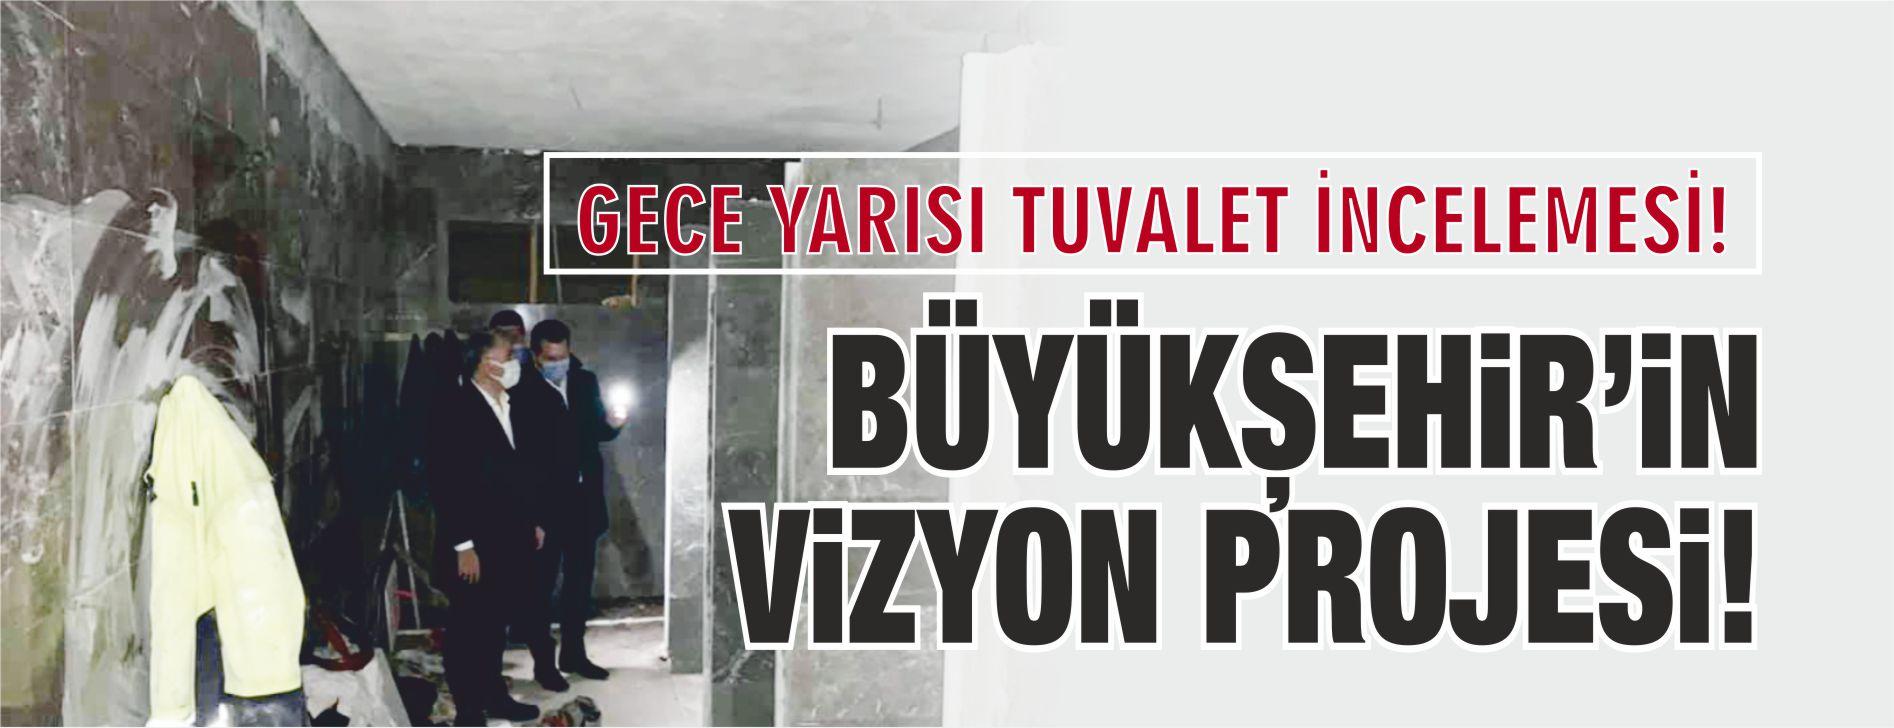 GECE YARISI TUVALET İNCELEMESİ!